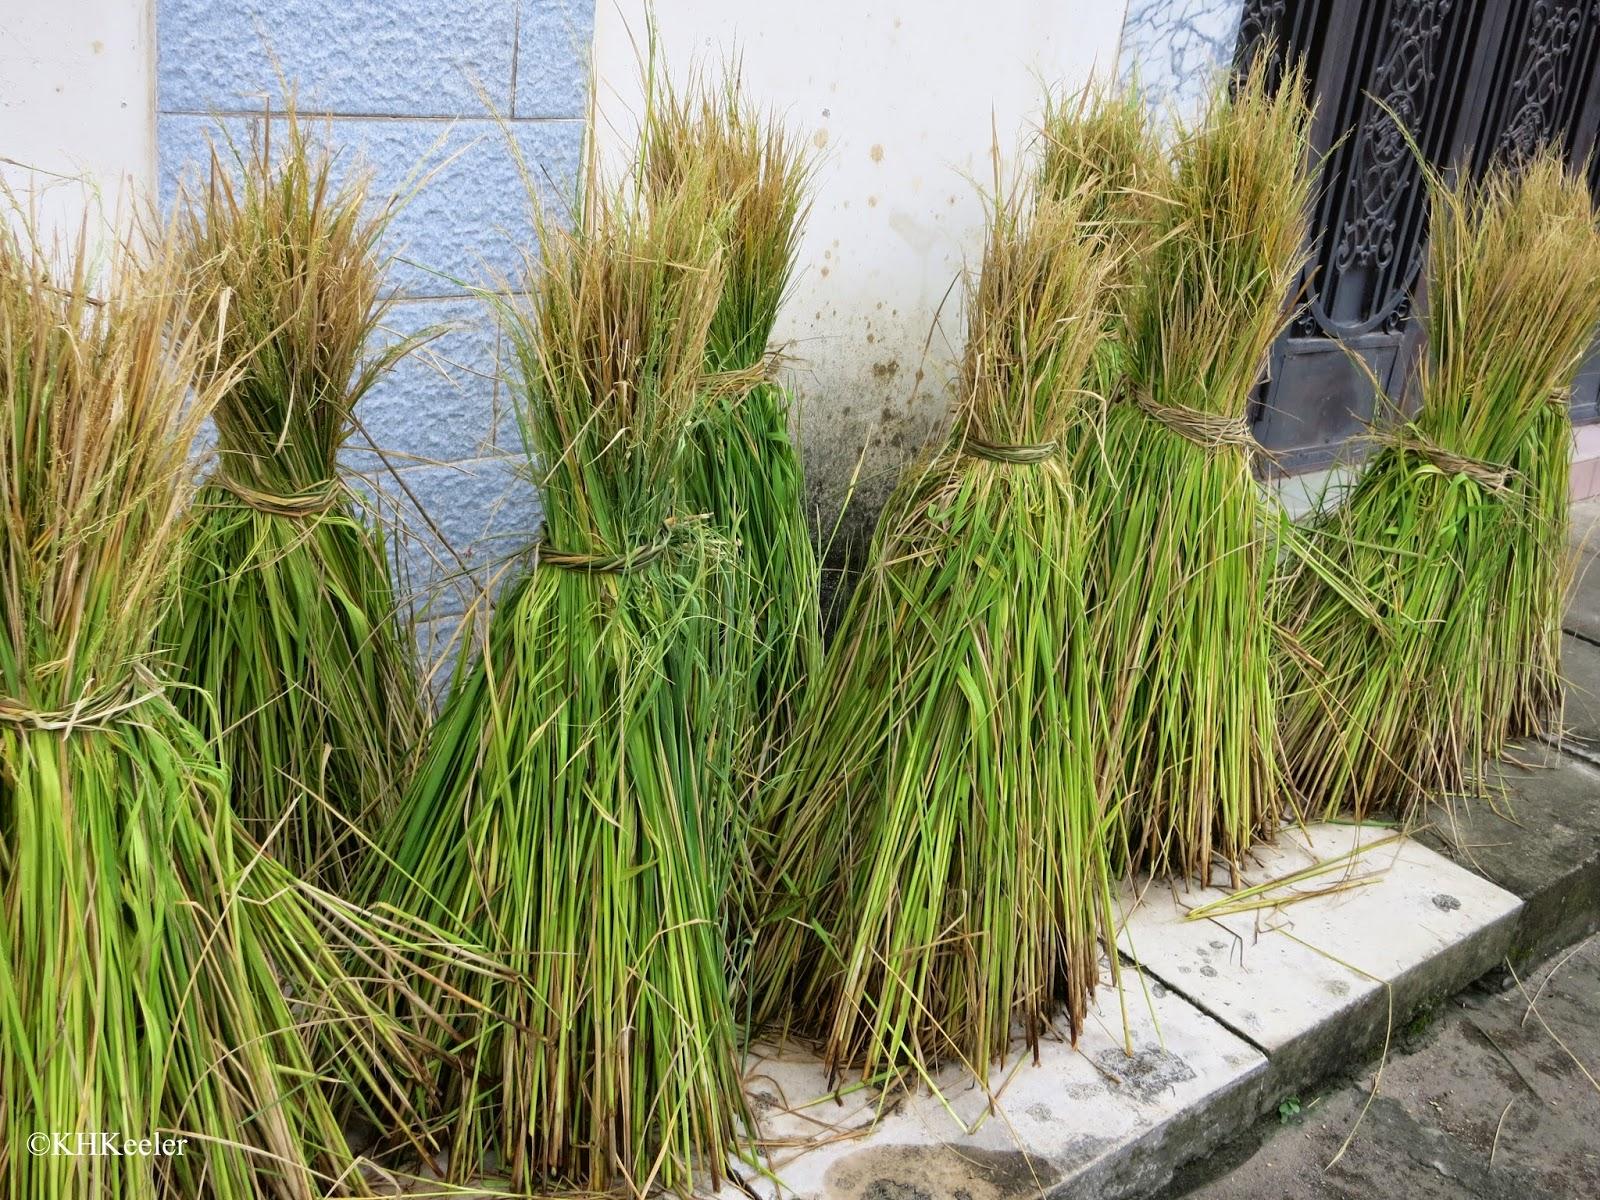 rice straw drying